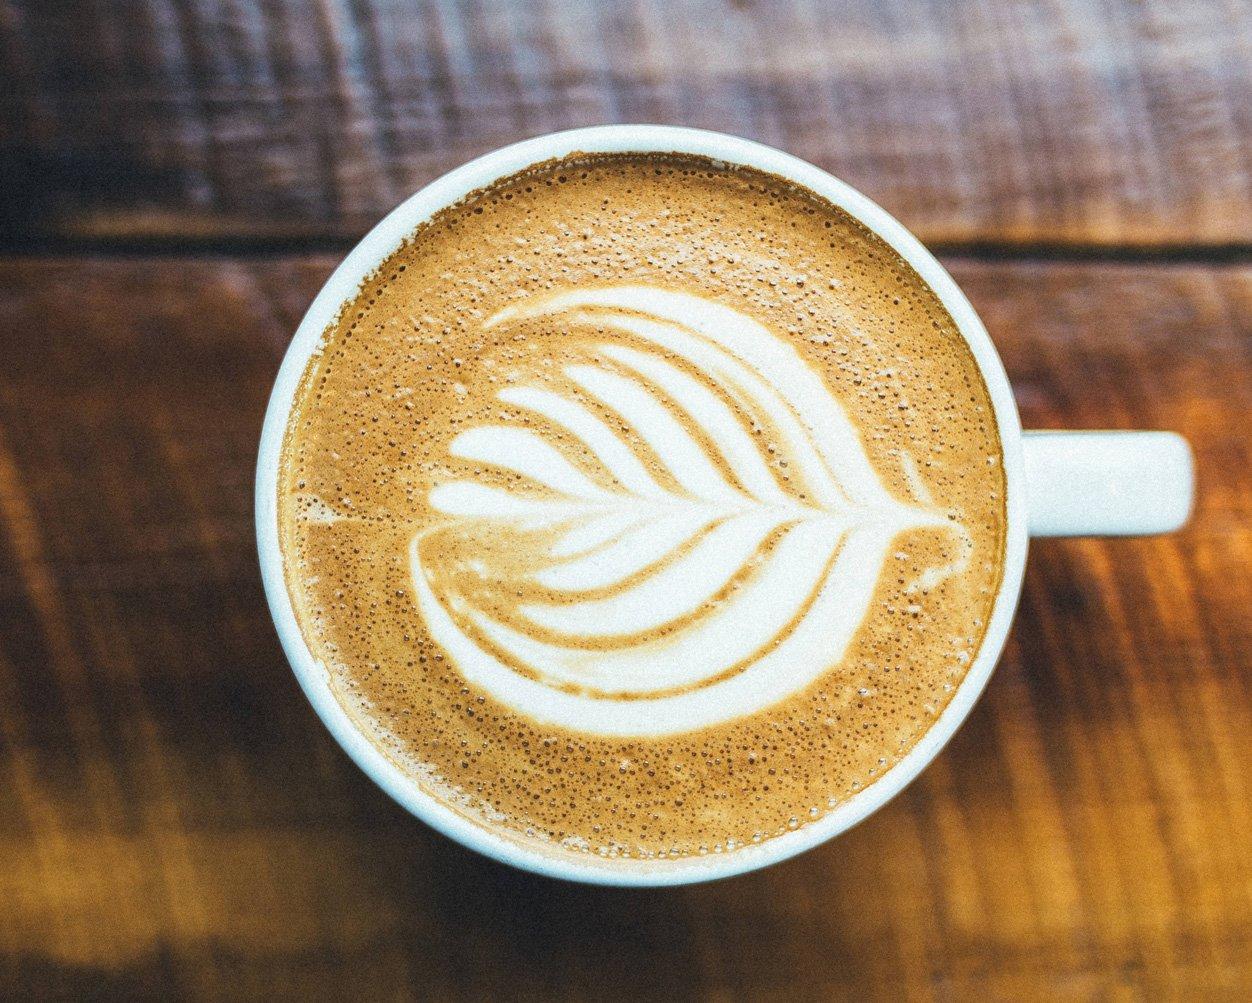 cafe-aulait